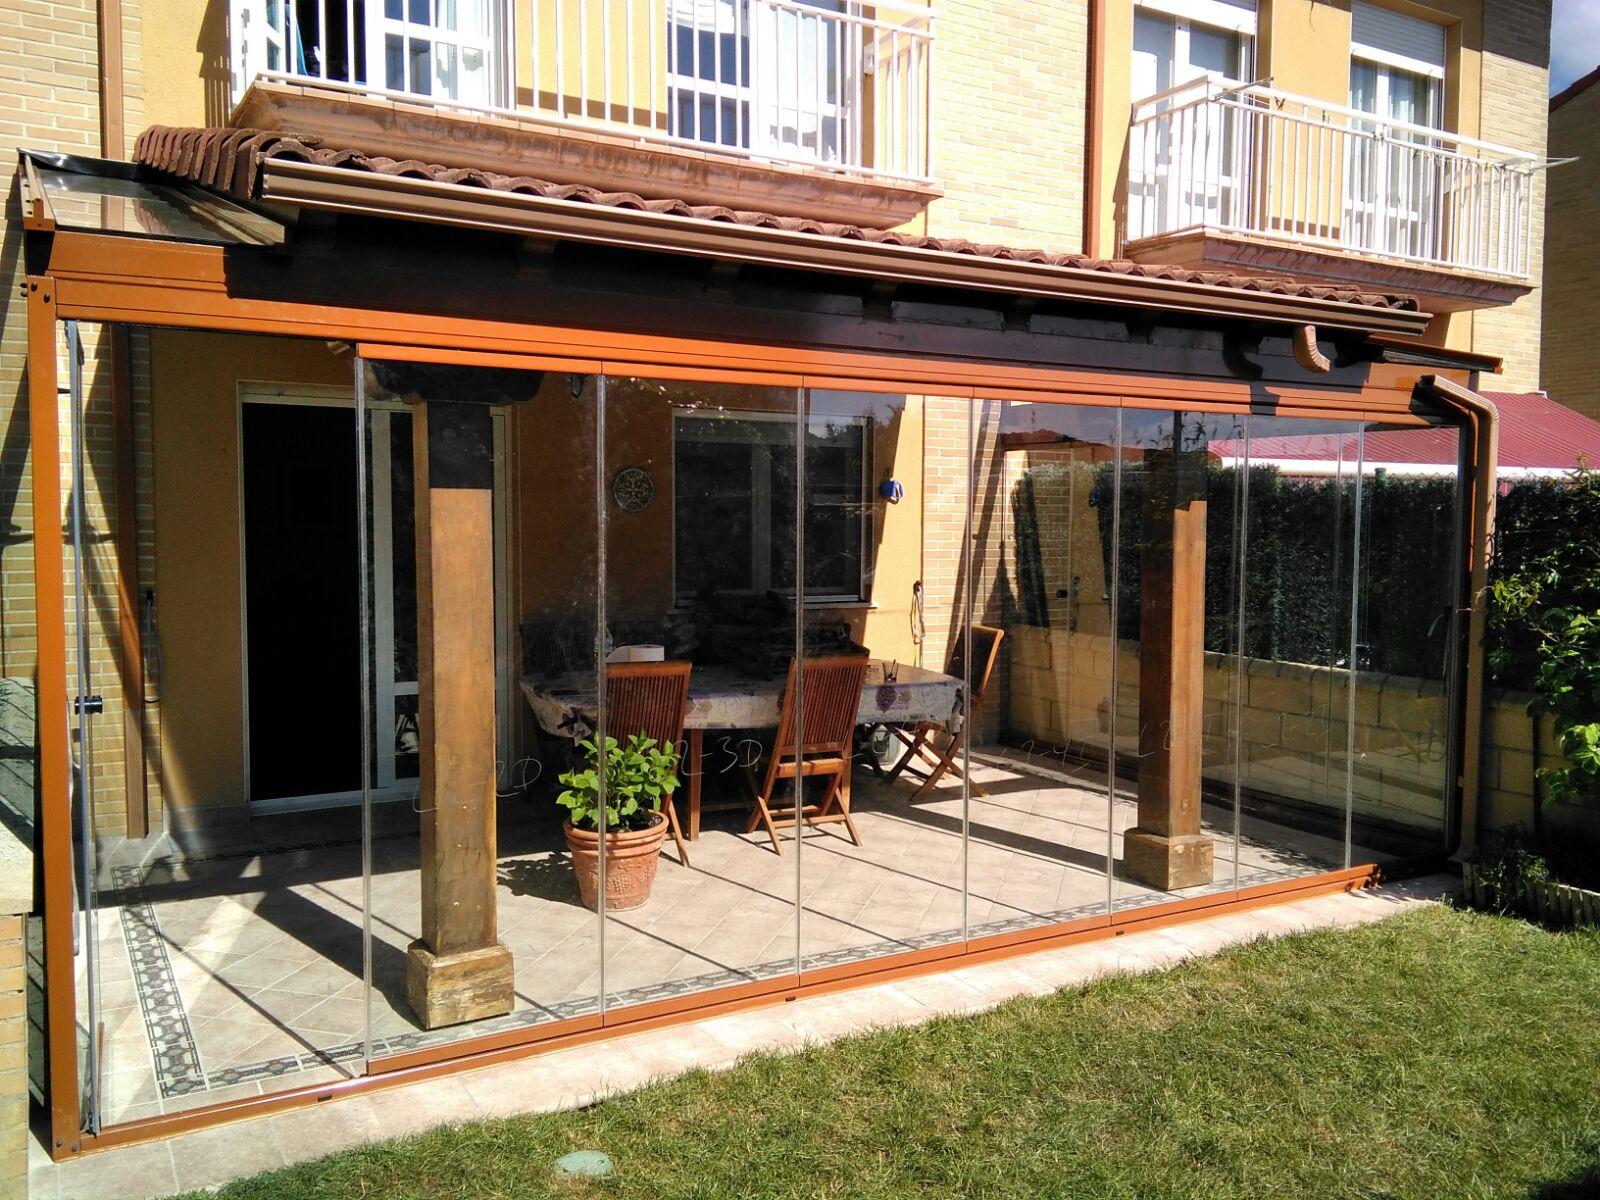 Porches de aluminio imitacion madera galnot with porches - Porches de aluminio y cristal ...